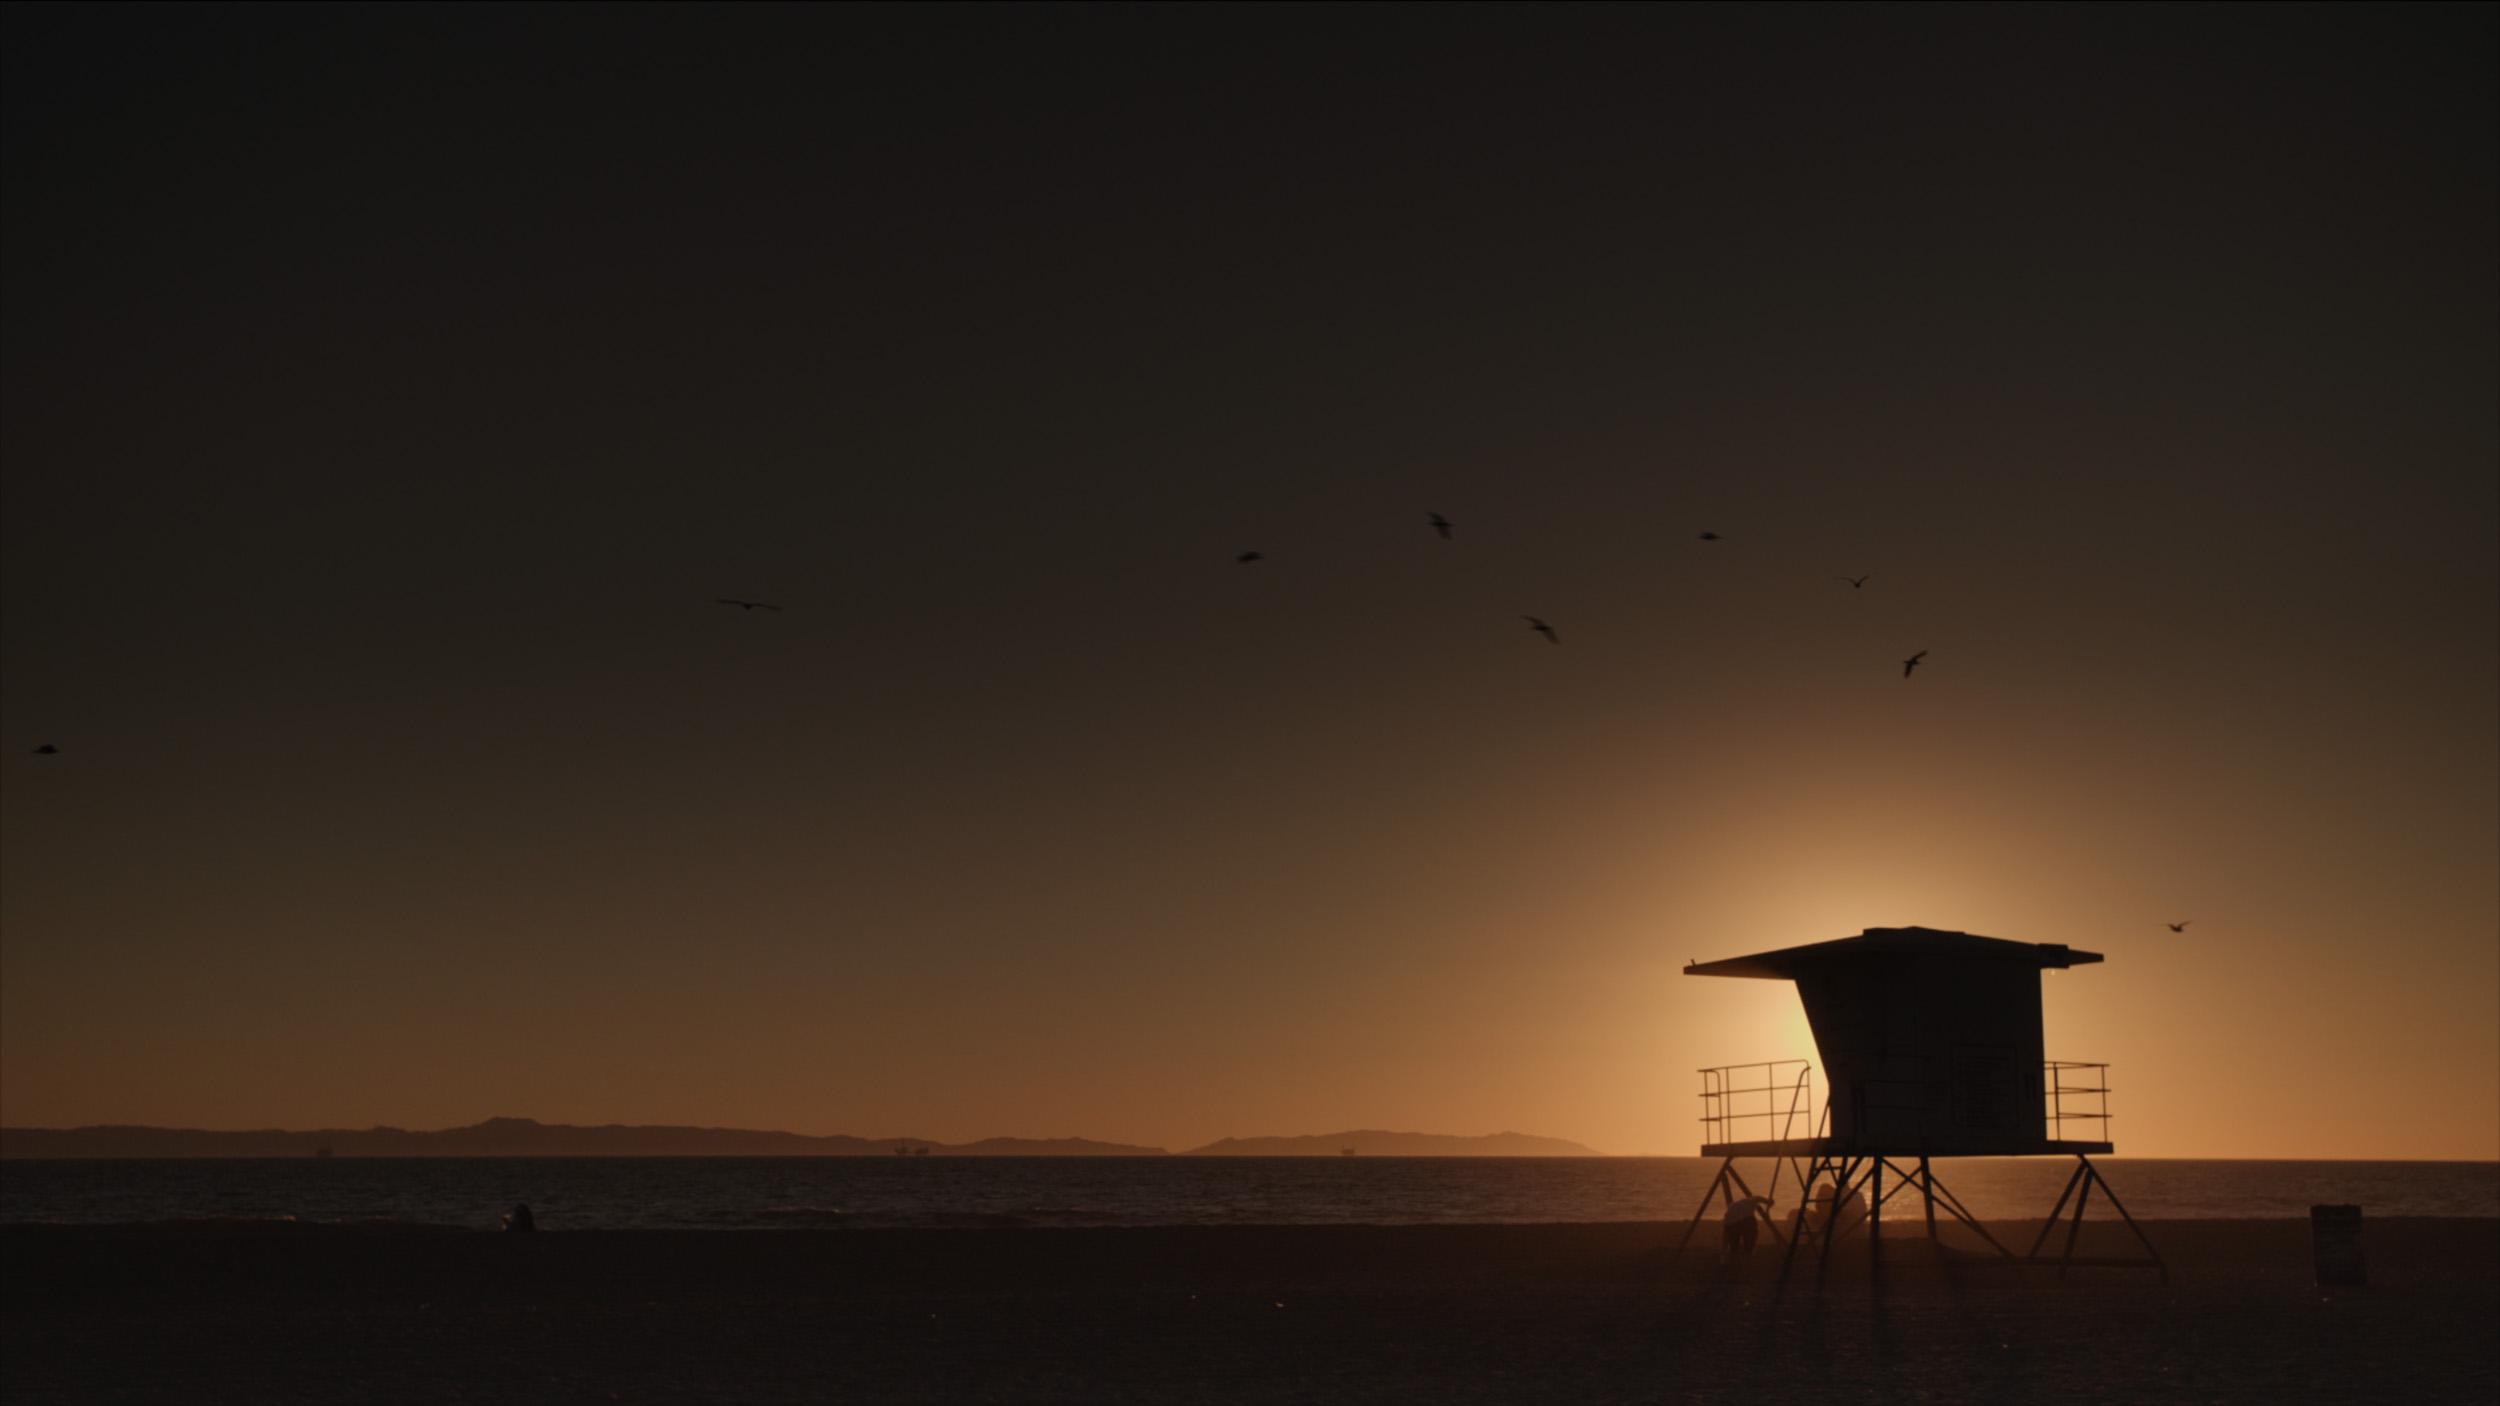 sunset at long beach by jevgenij tichonov.jpg